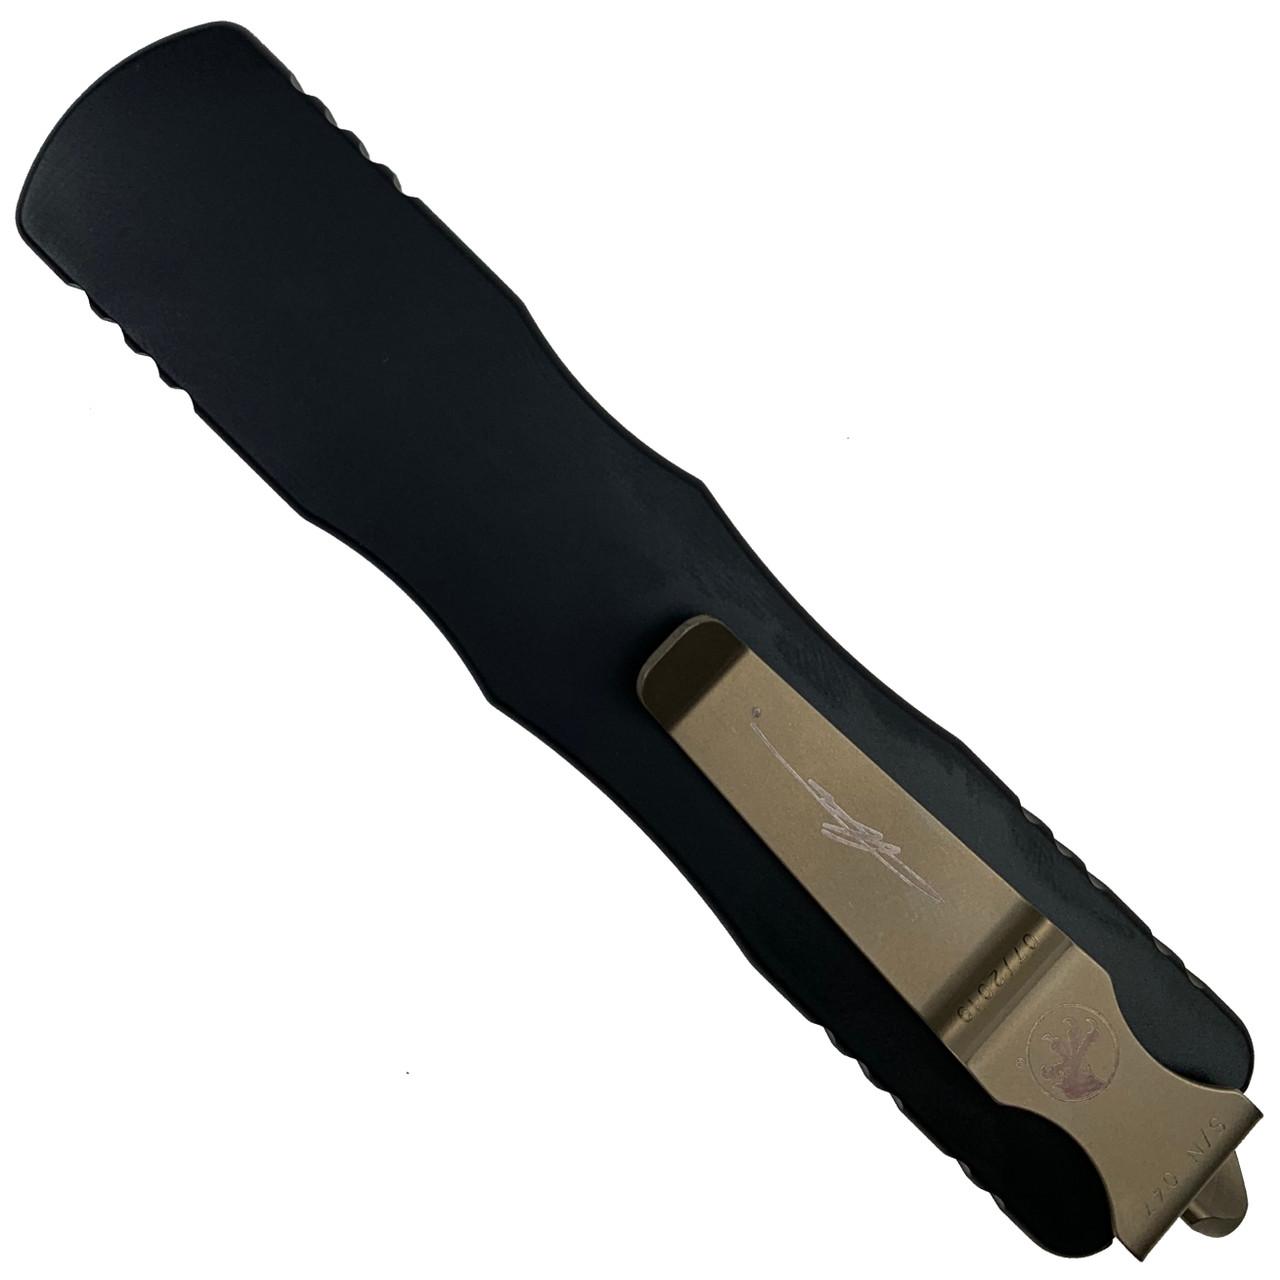 Microtech Dirac Delta Dagger OTF Auto Knife, Damascus Blade REAR VIEW